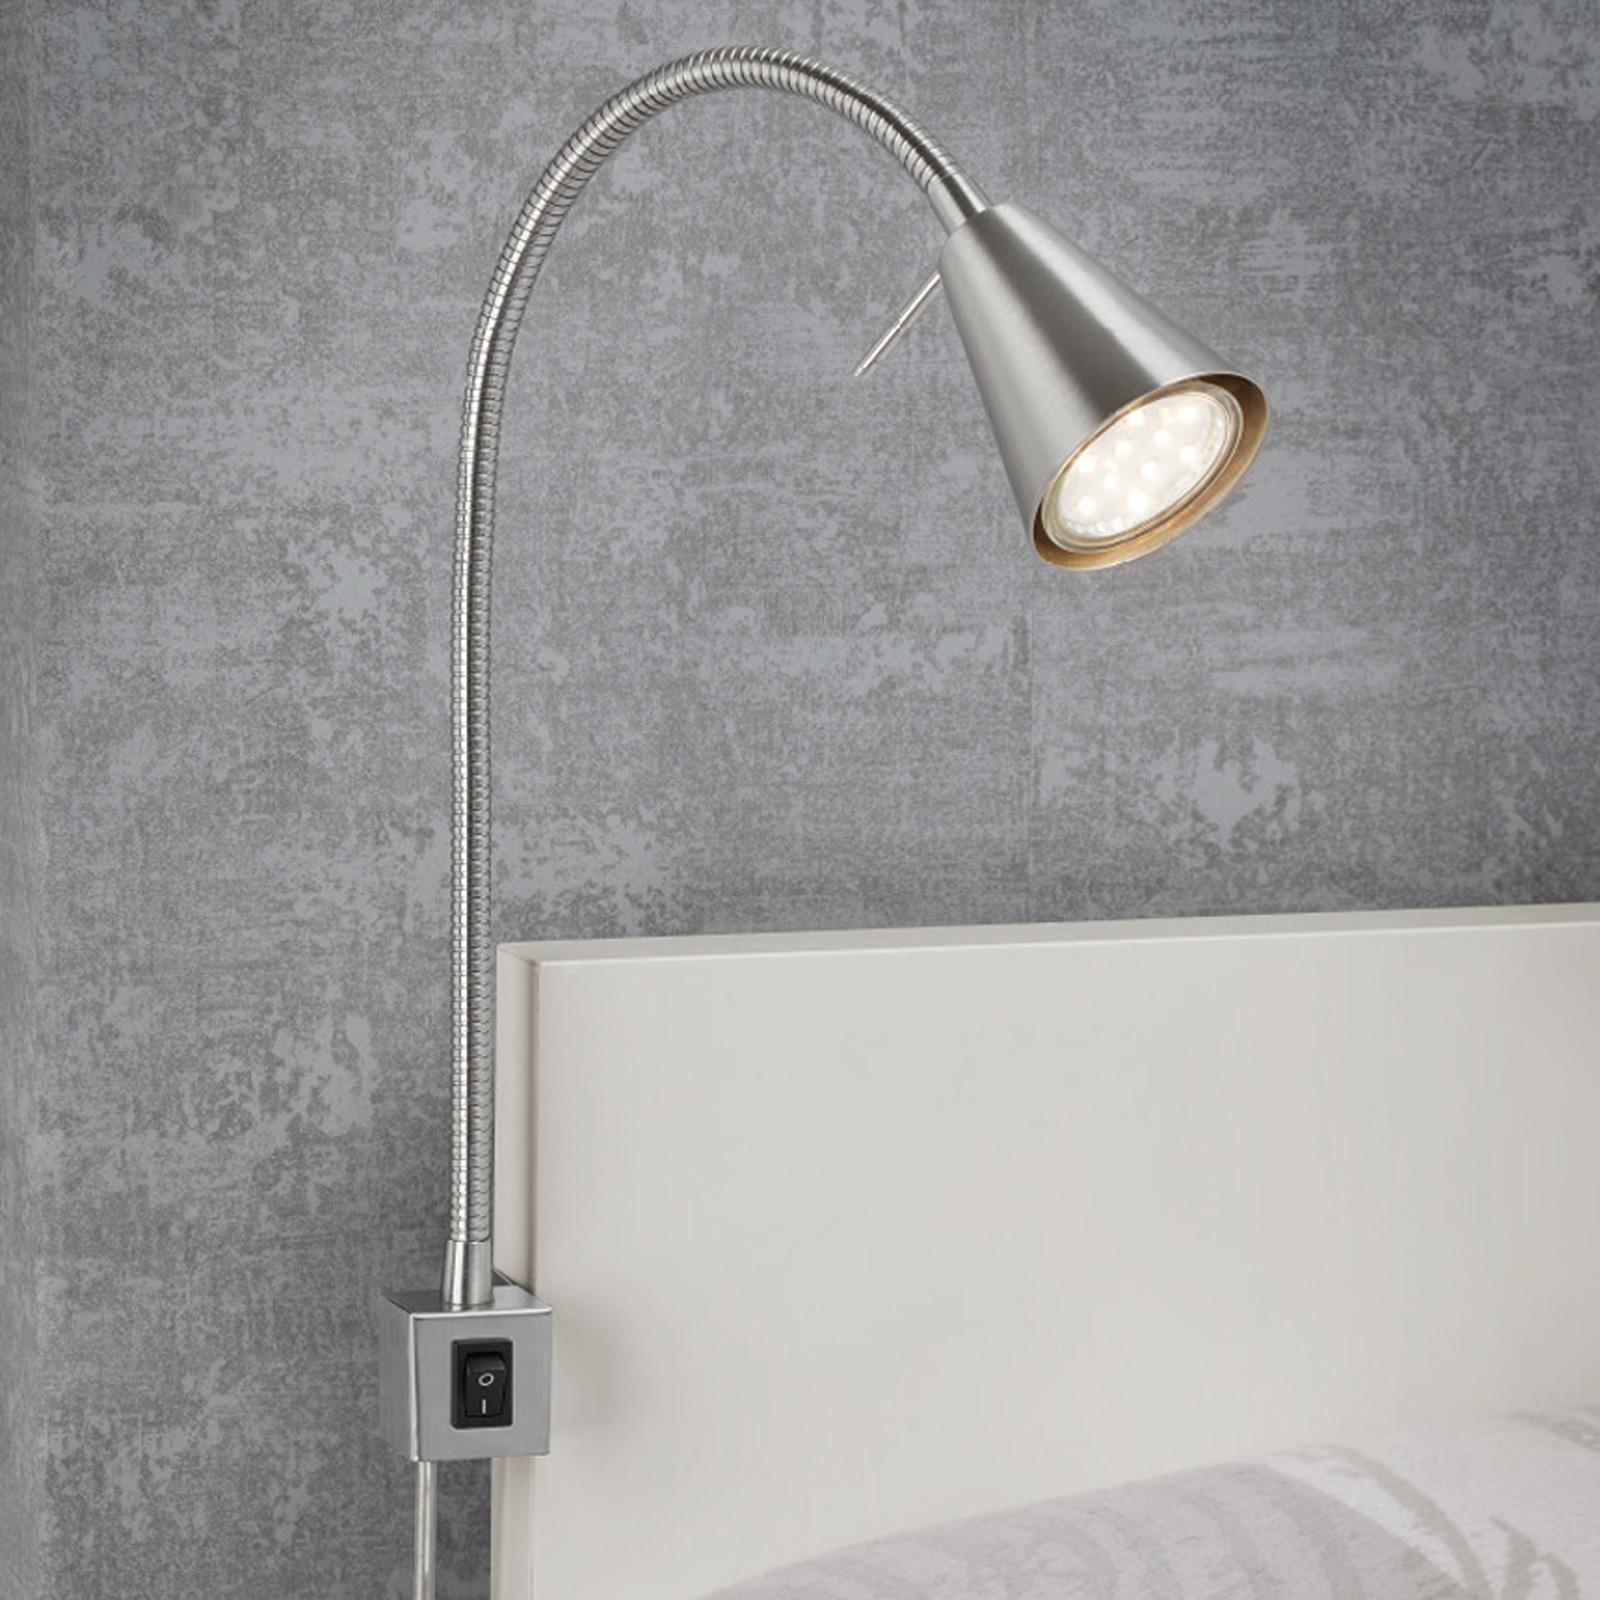 LED-vegglampe 2080 til montering på seng, nikkel